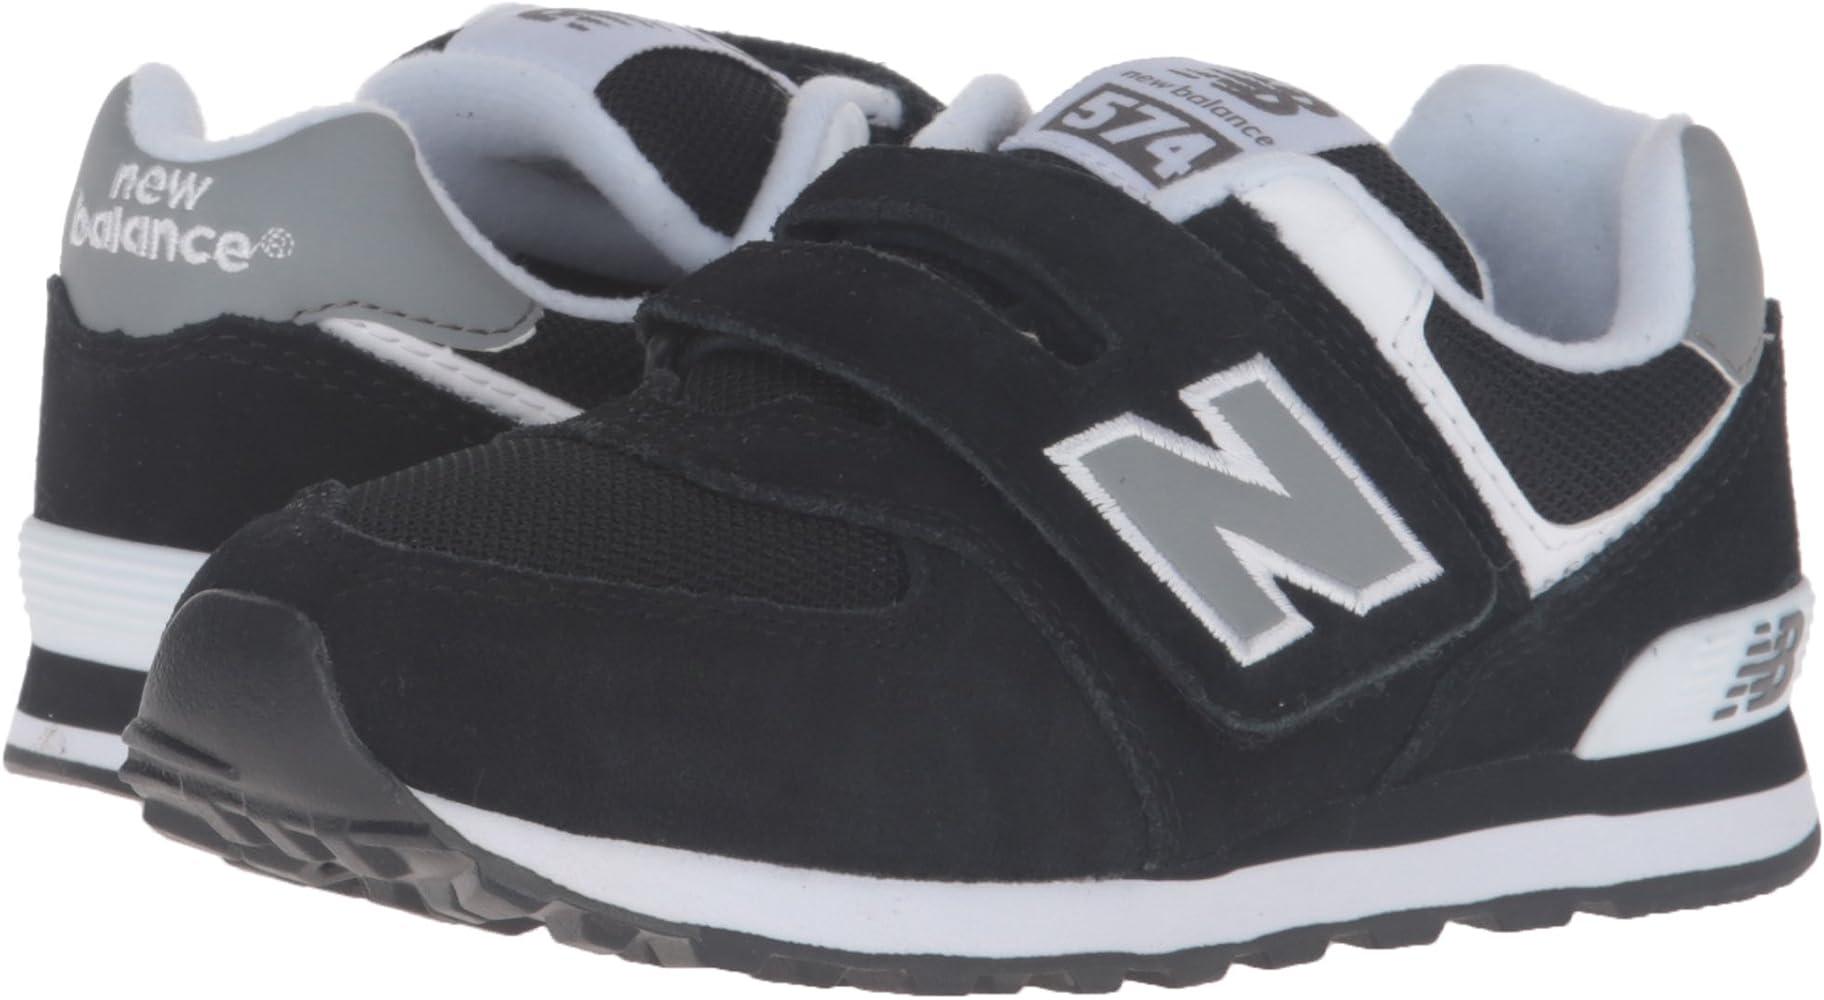 New Balance Kid's 574 V1 Core Sneaker, Black, 1 M ... - Amazon.com